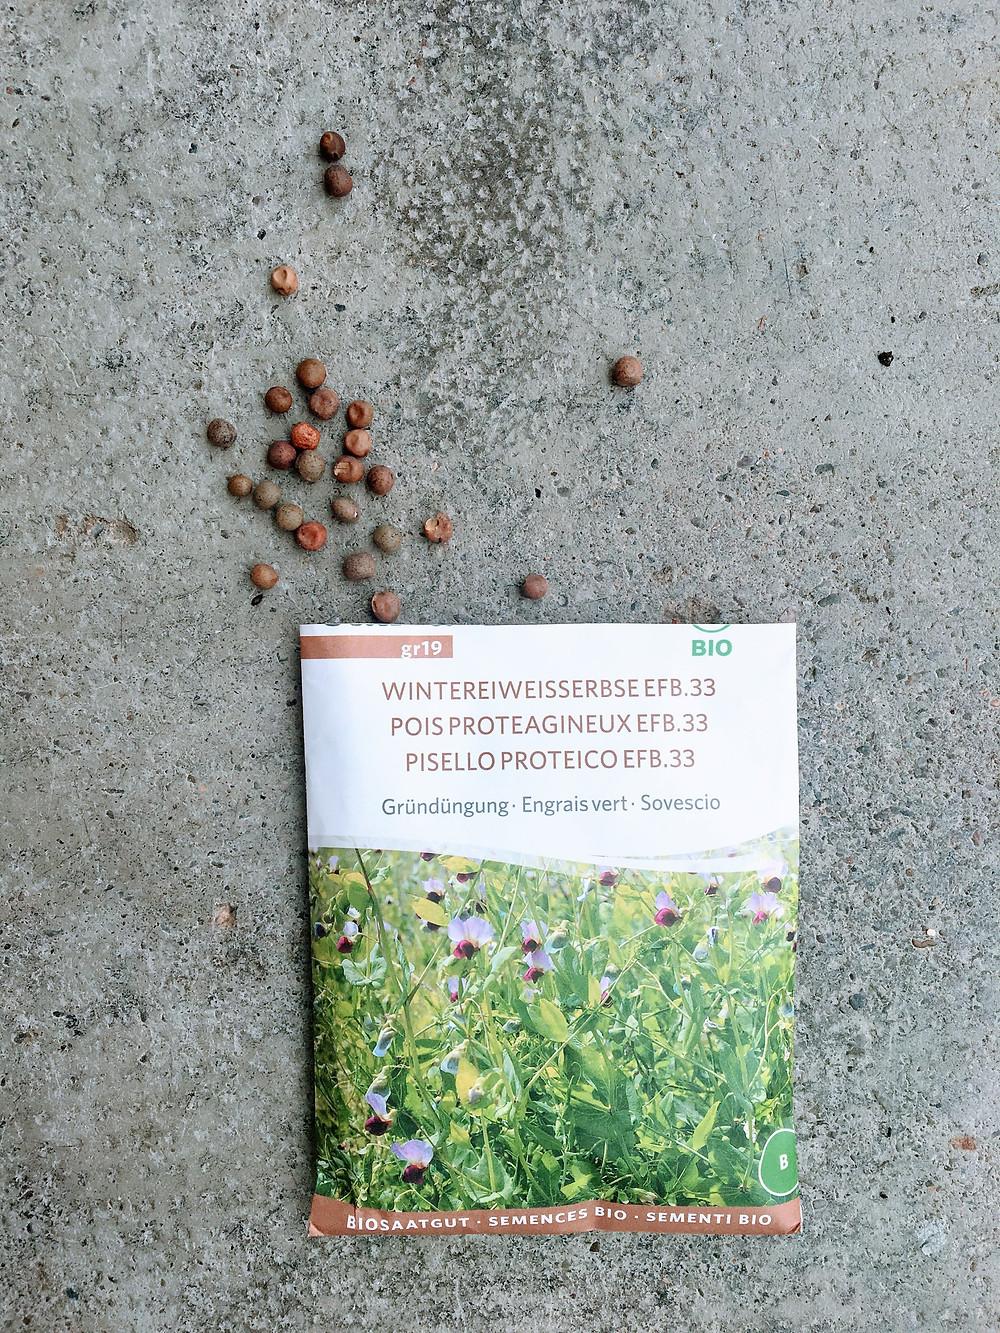 saatgut, bio saatgut, bio samen, sativa rheinau, wintereiweisserbse, gründüngung, stickstoff fixierer, erbse, samen, winter crops, winter ernte